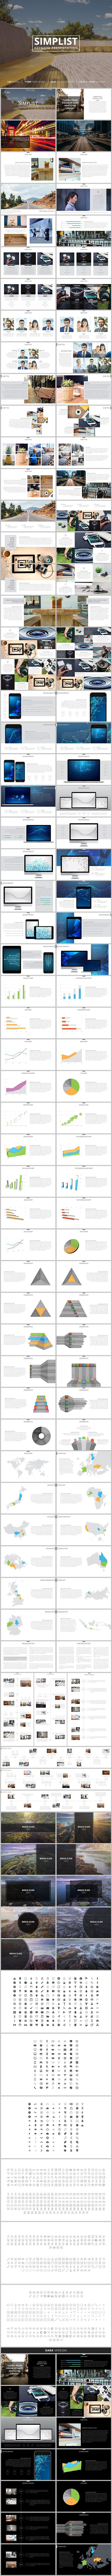 Simplist Keynote Presentation Template. Download here: http://graphicriver.net/item/simplist-keynote-presentation/15924566?ref=ksioks